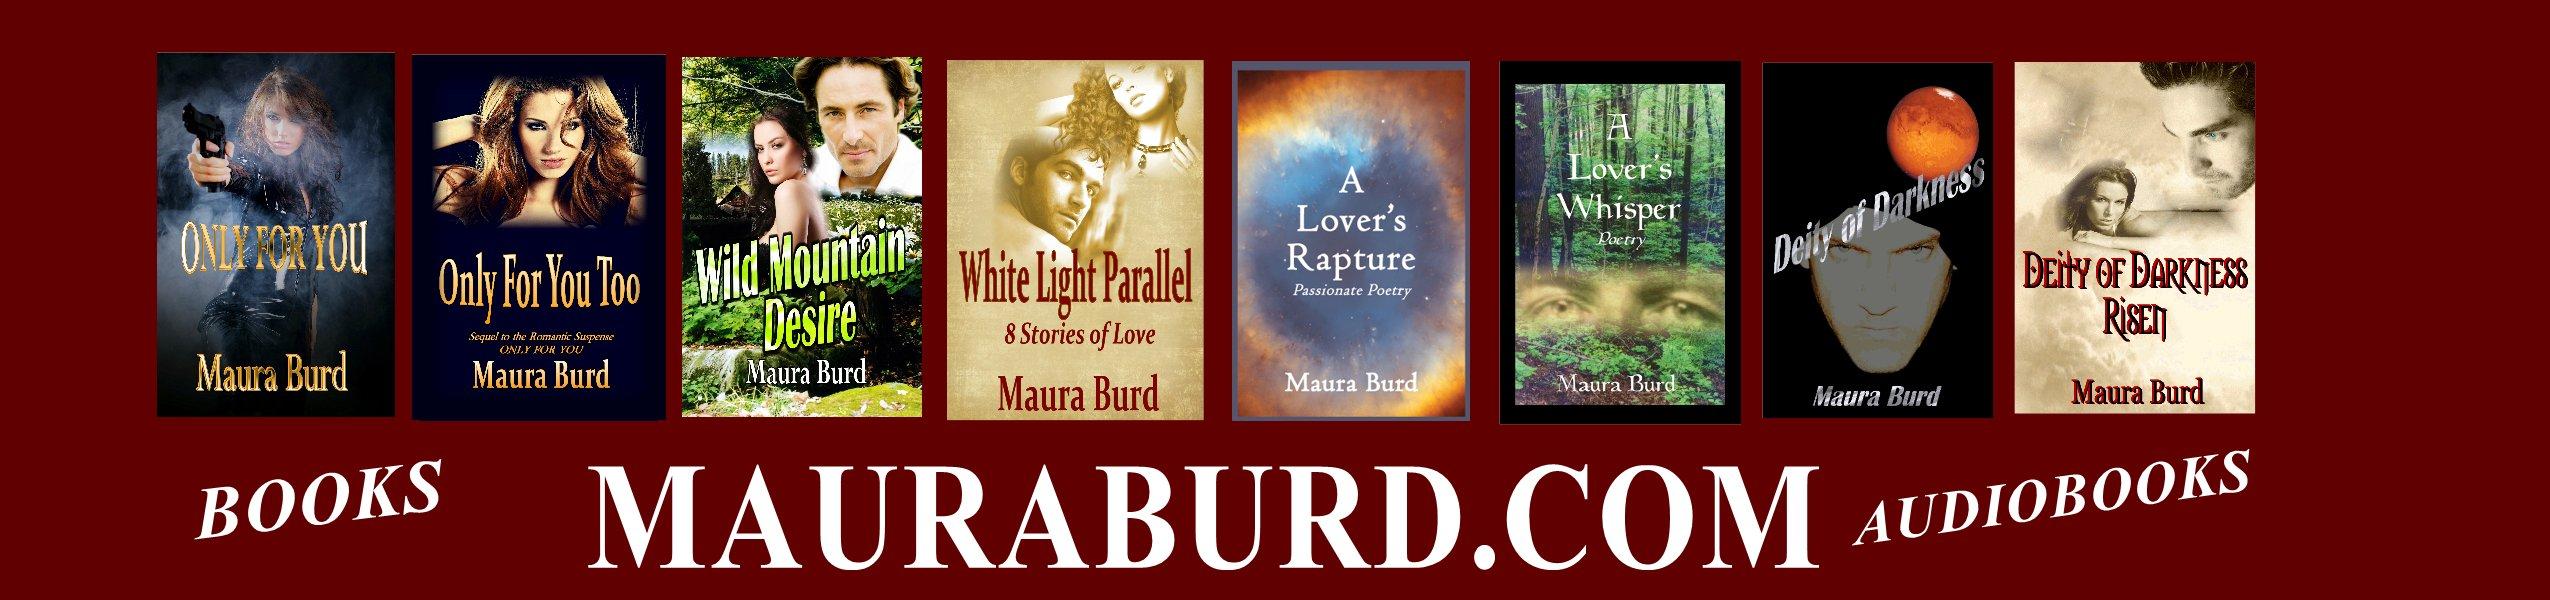 Maura's Books - Maura Burd